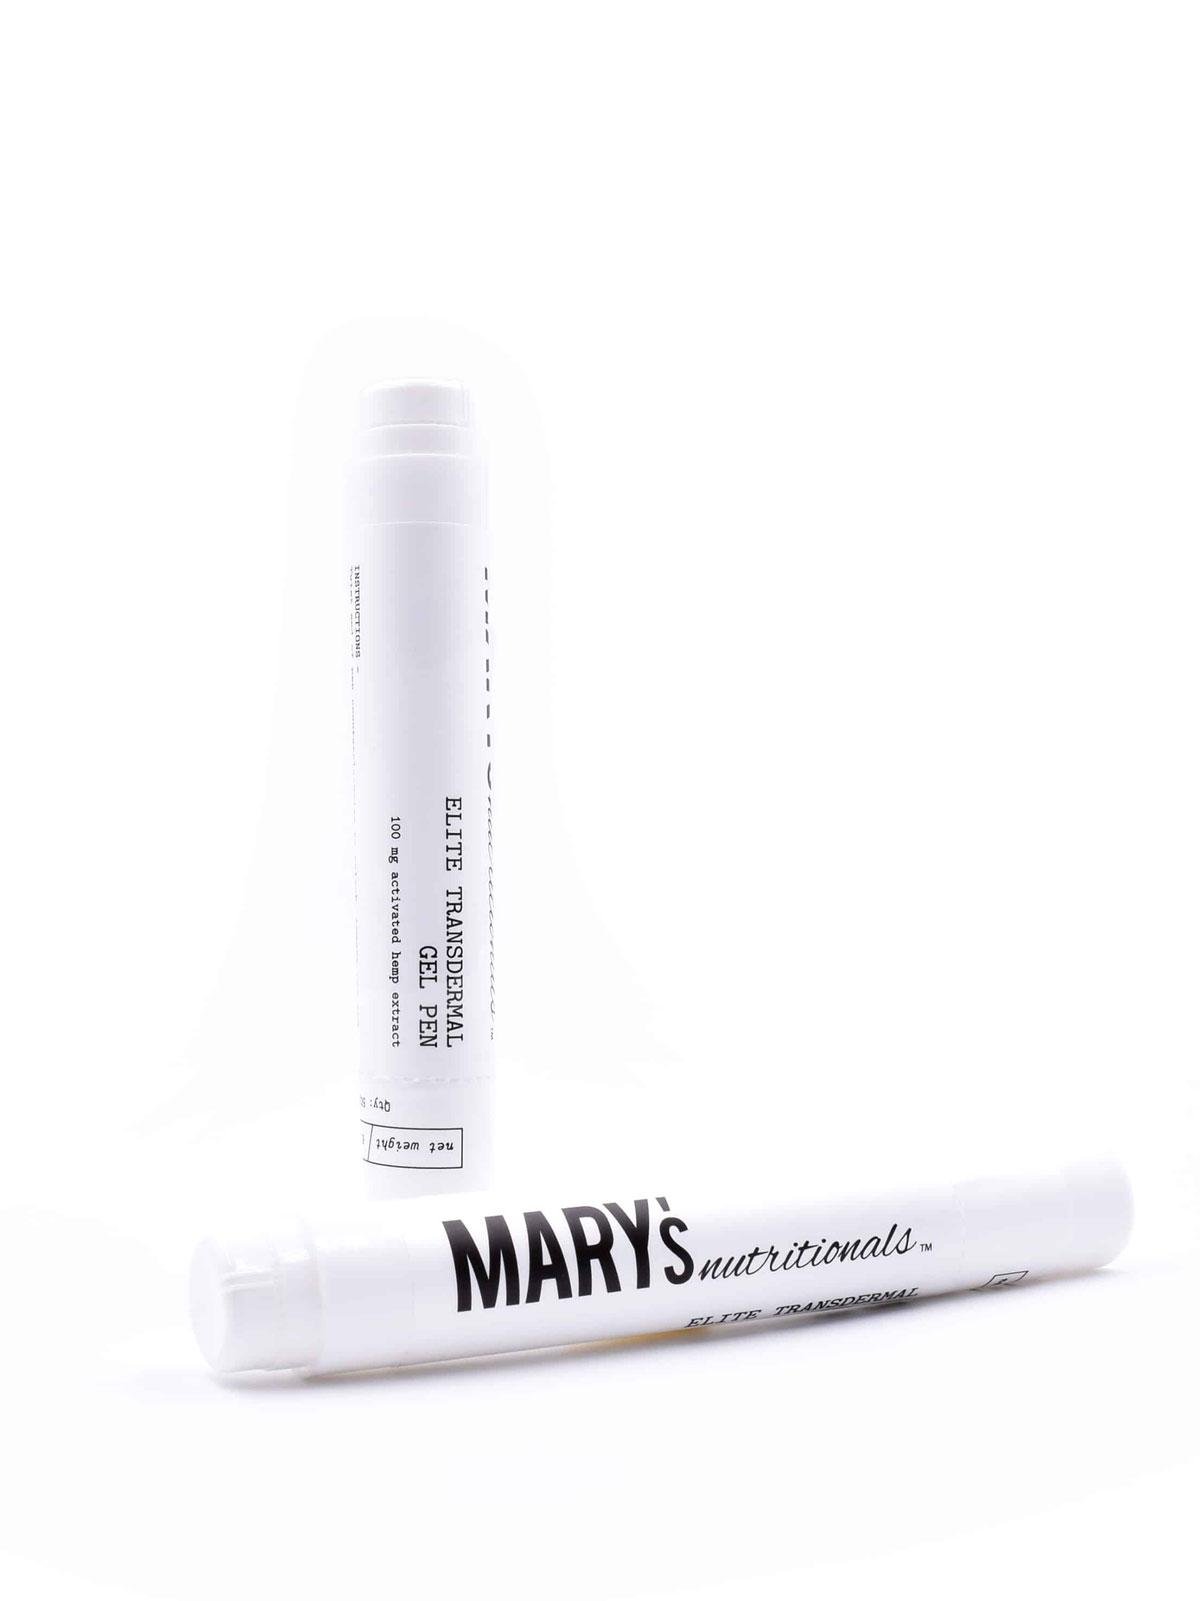 Mary's Transdermal Gel Pen